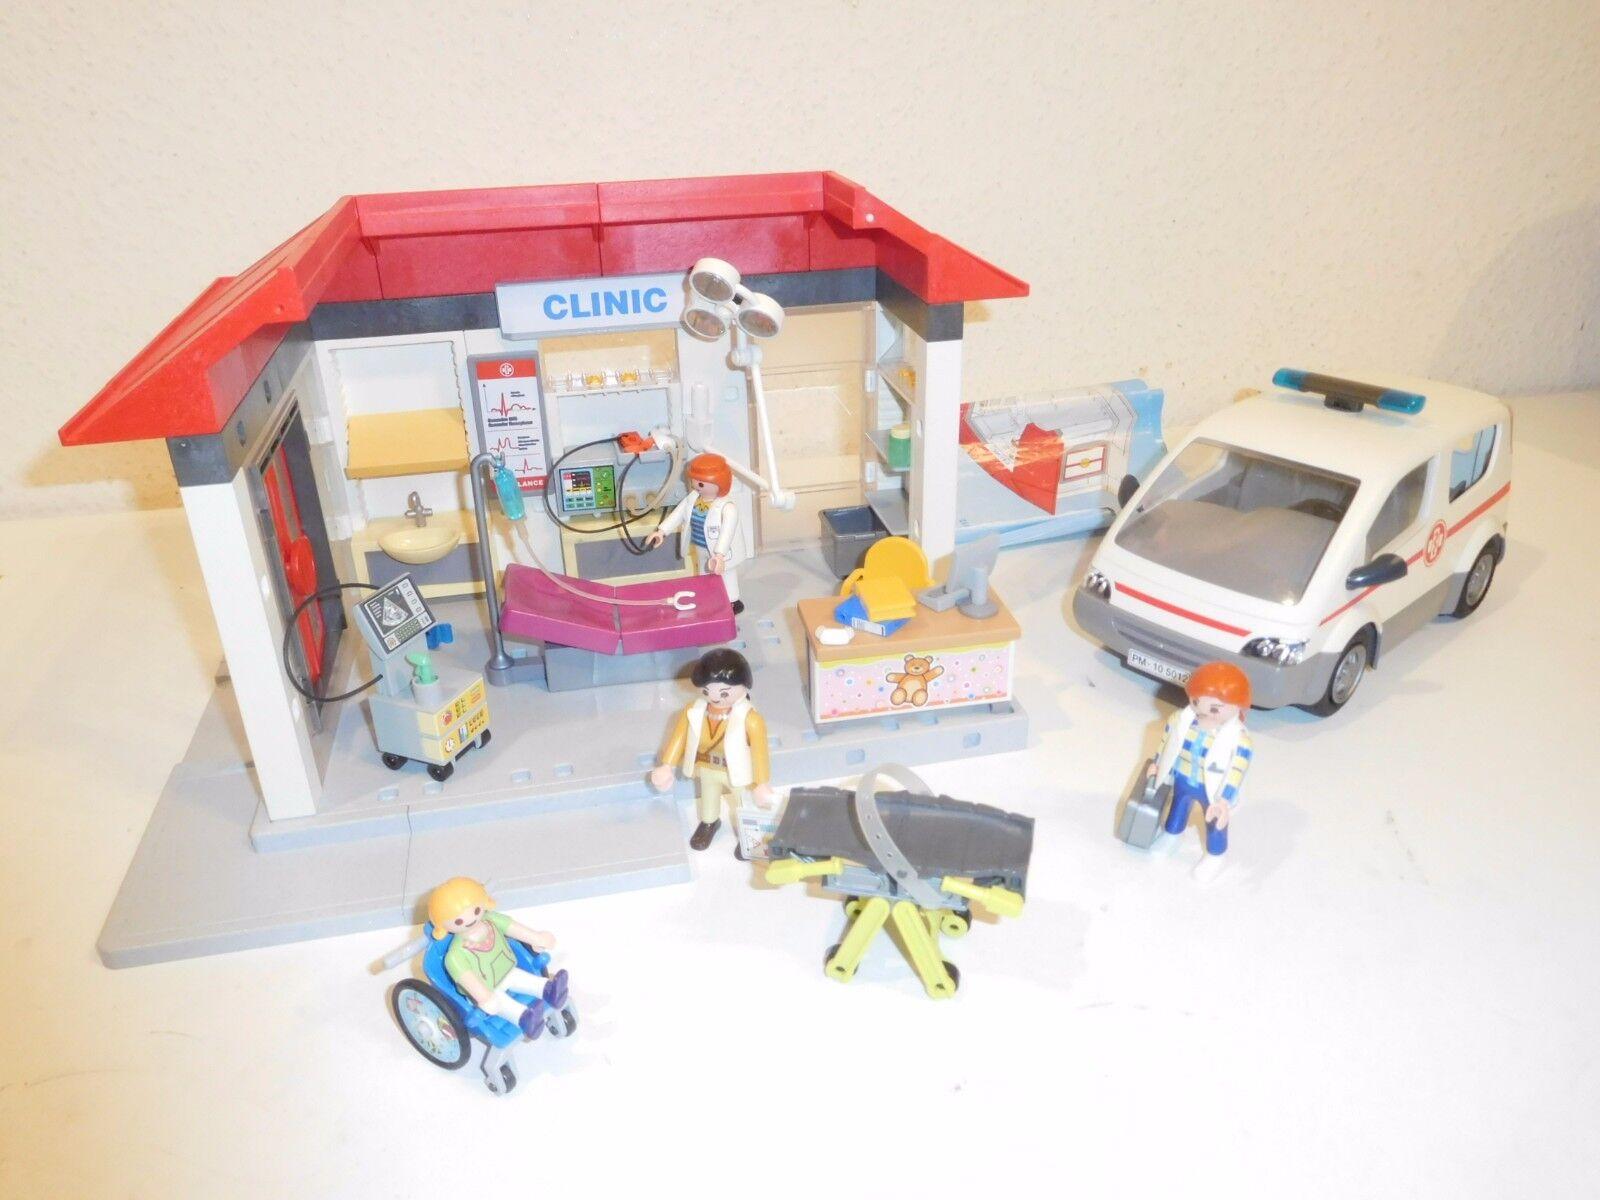 Playmobil 5012 clinic ambulance hospital